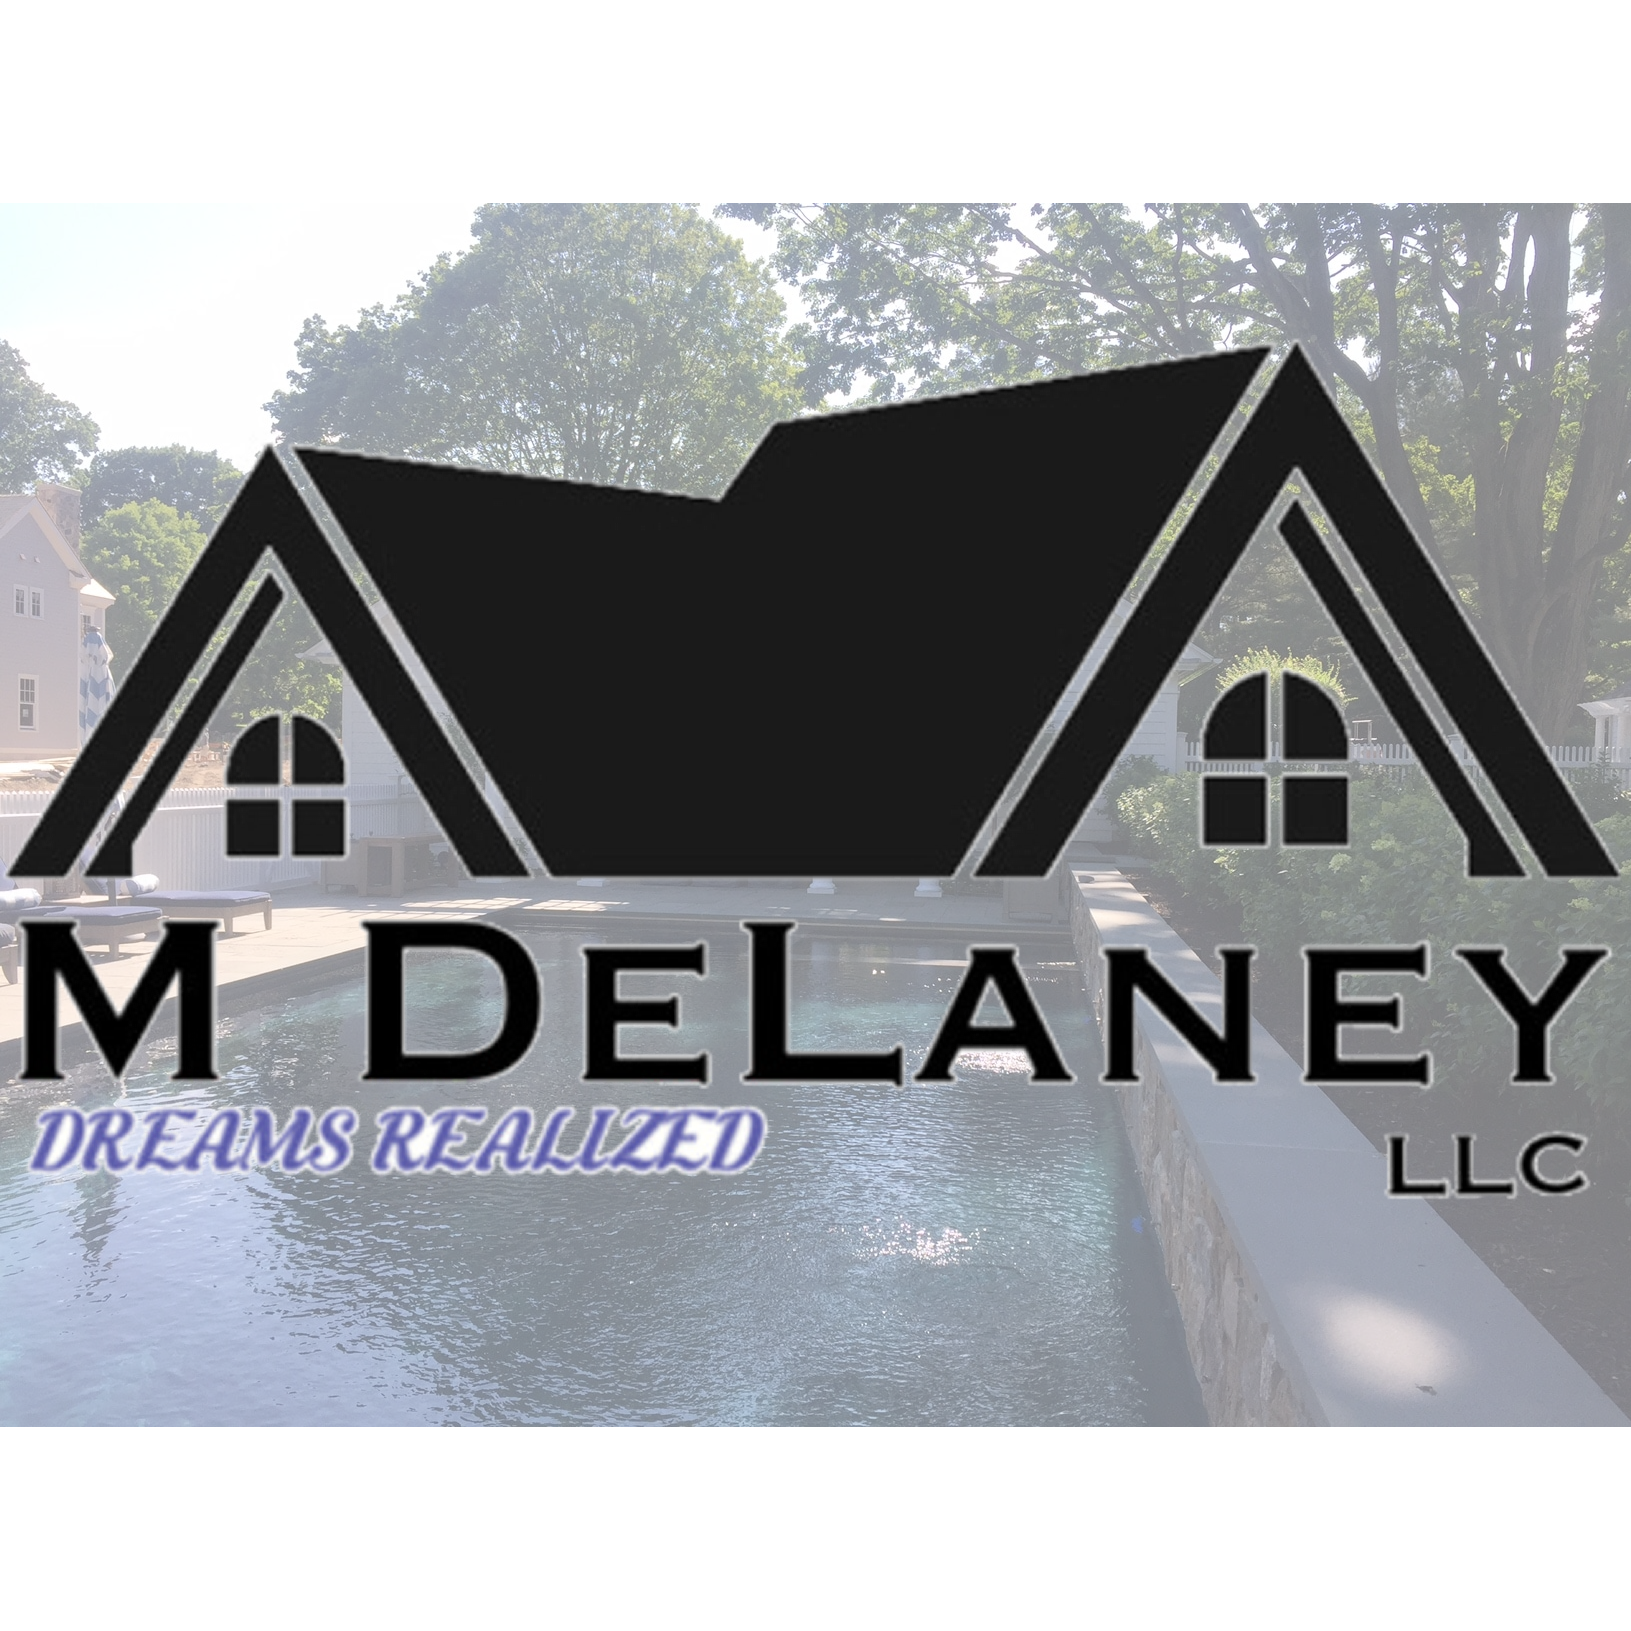 M. DeLaney, LLC.